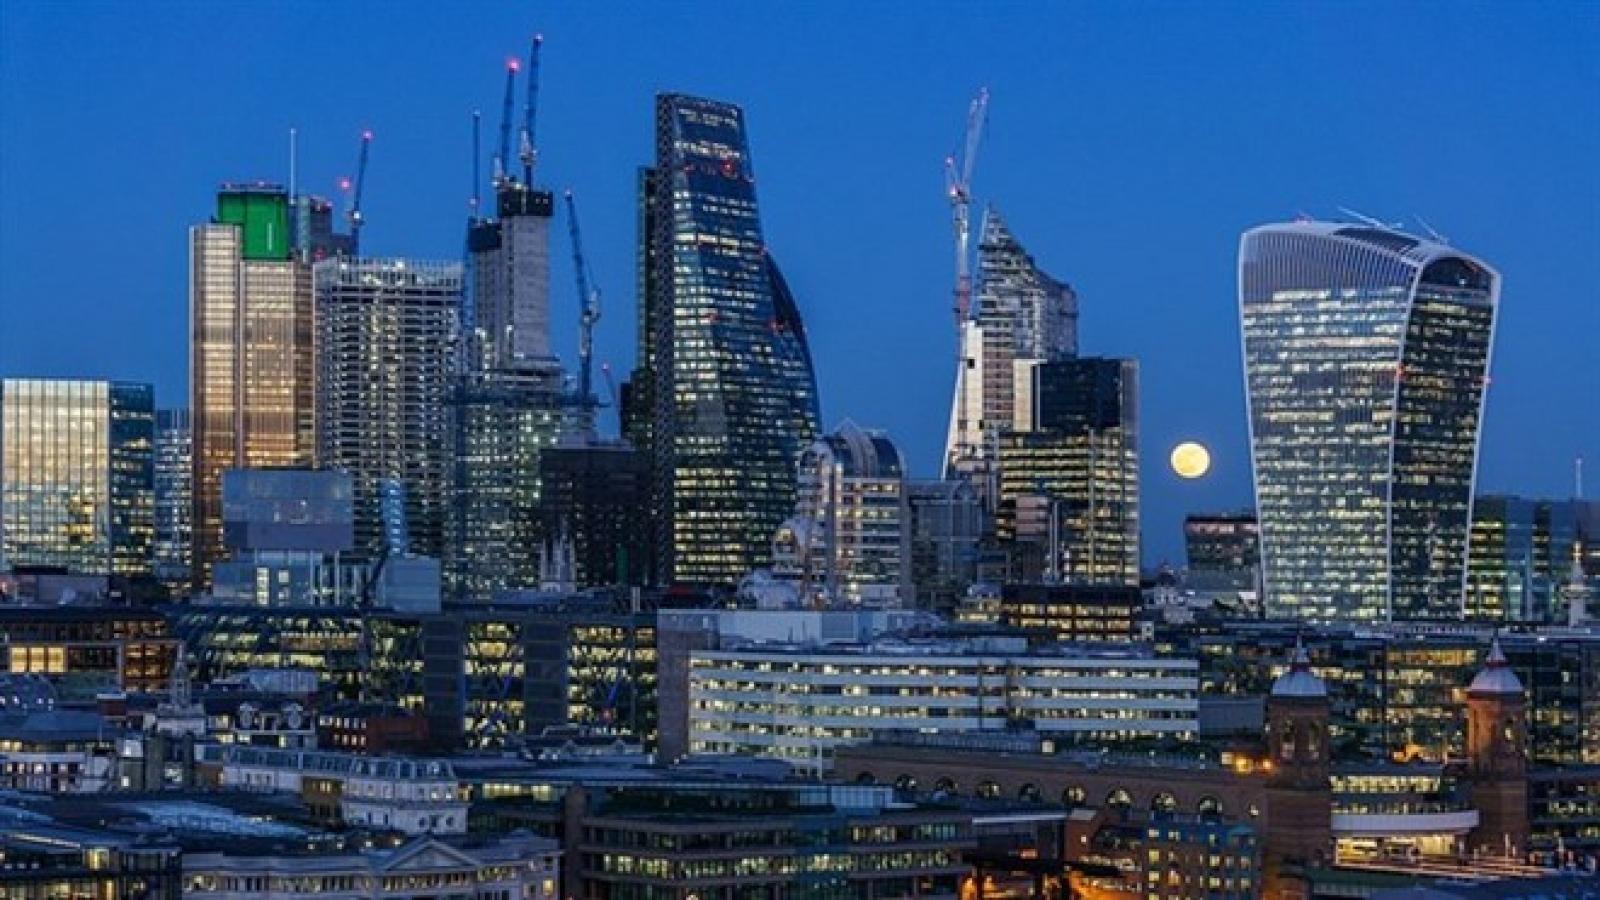 UK-Vietnam Business Forum to be held in London